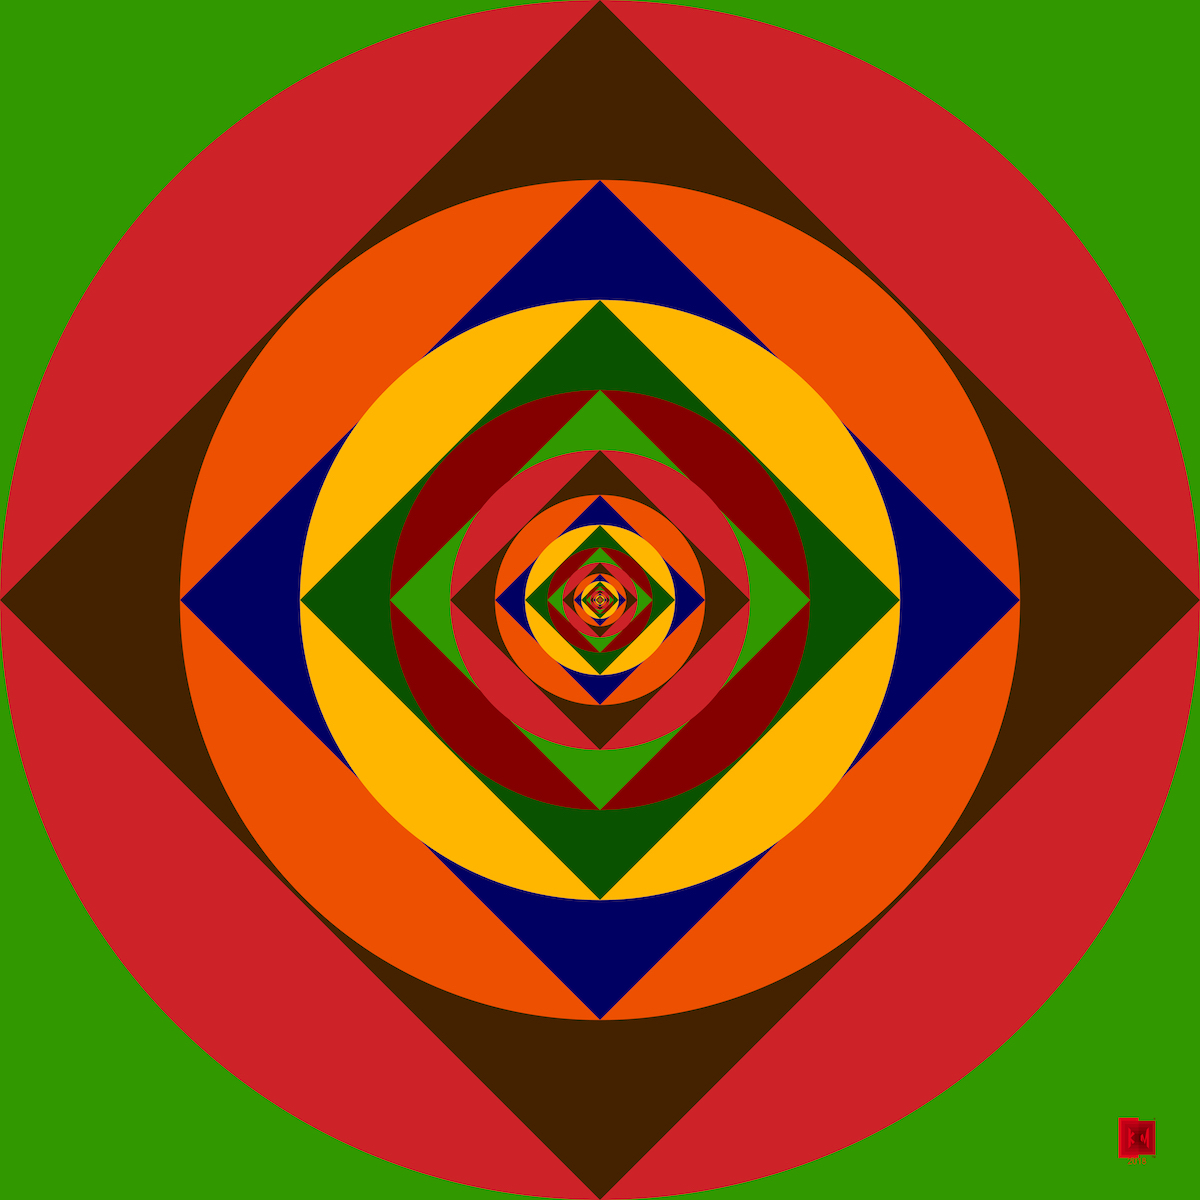 110 Fissazione (800 x 800).jpg